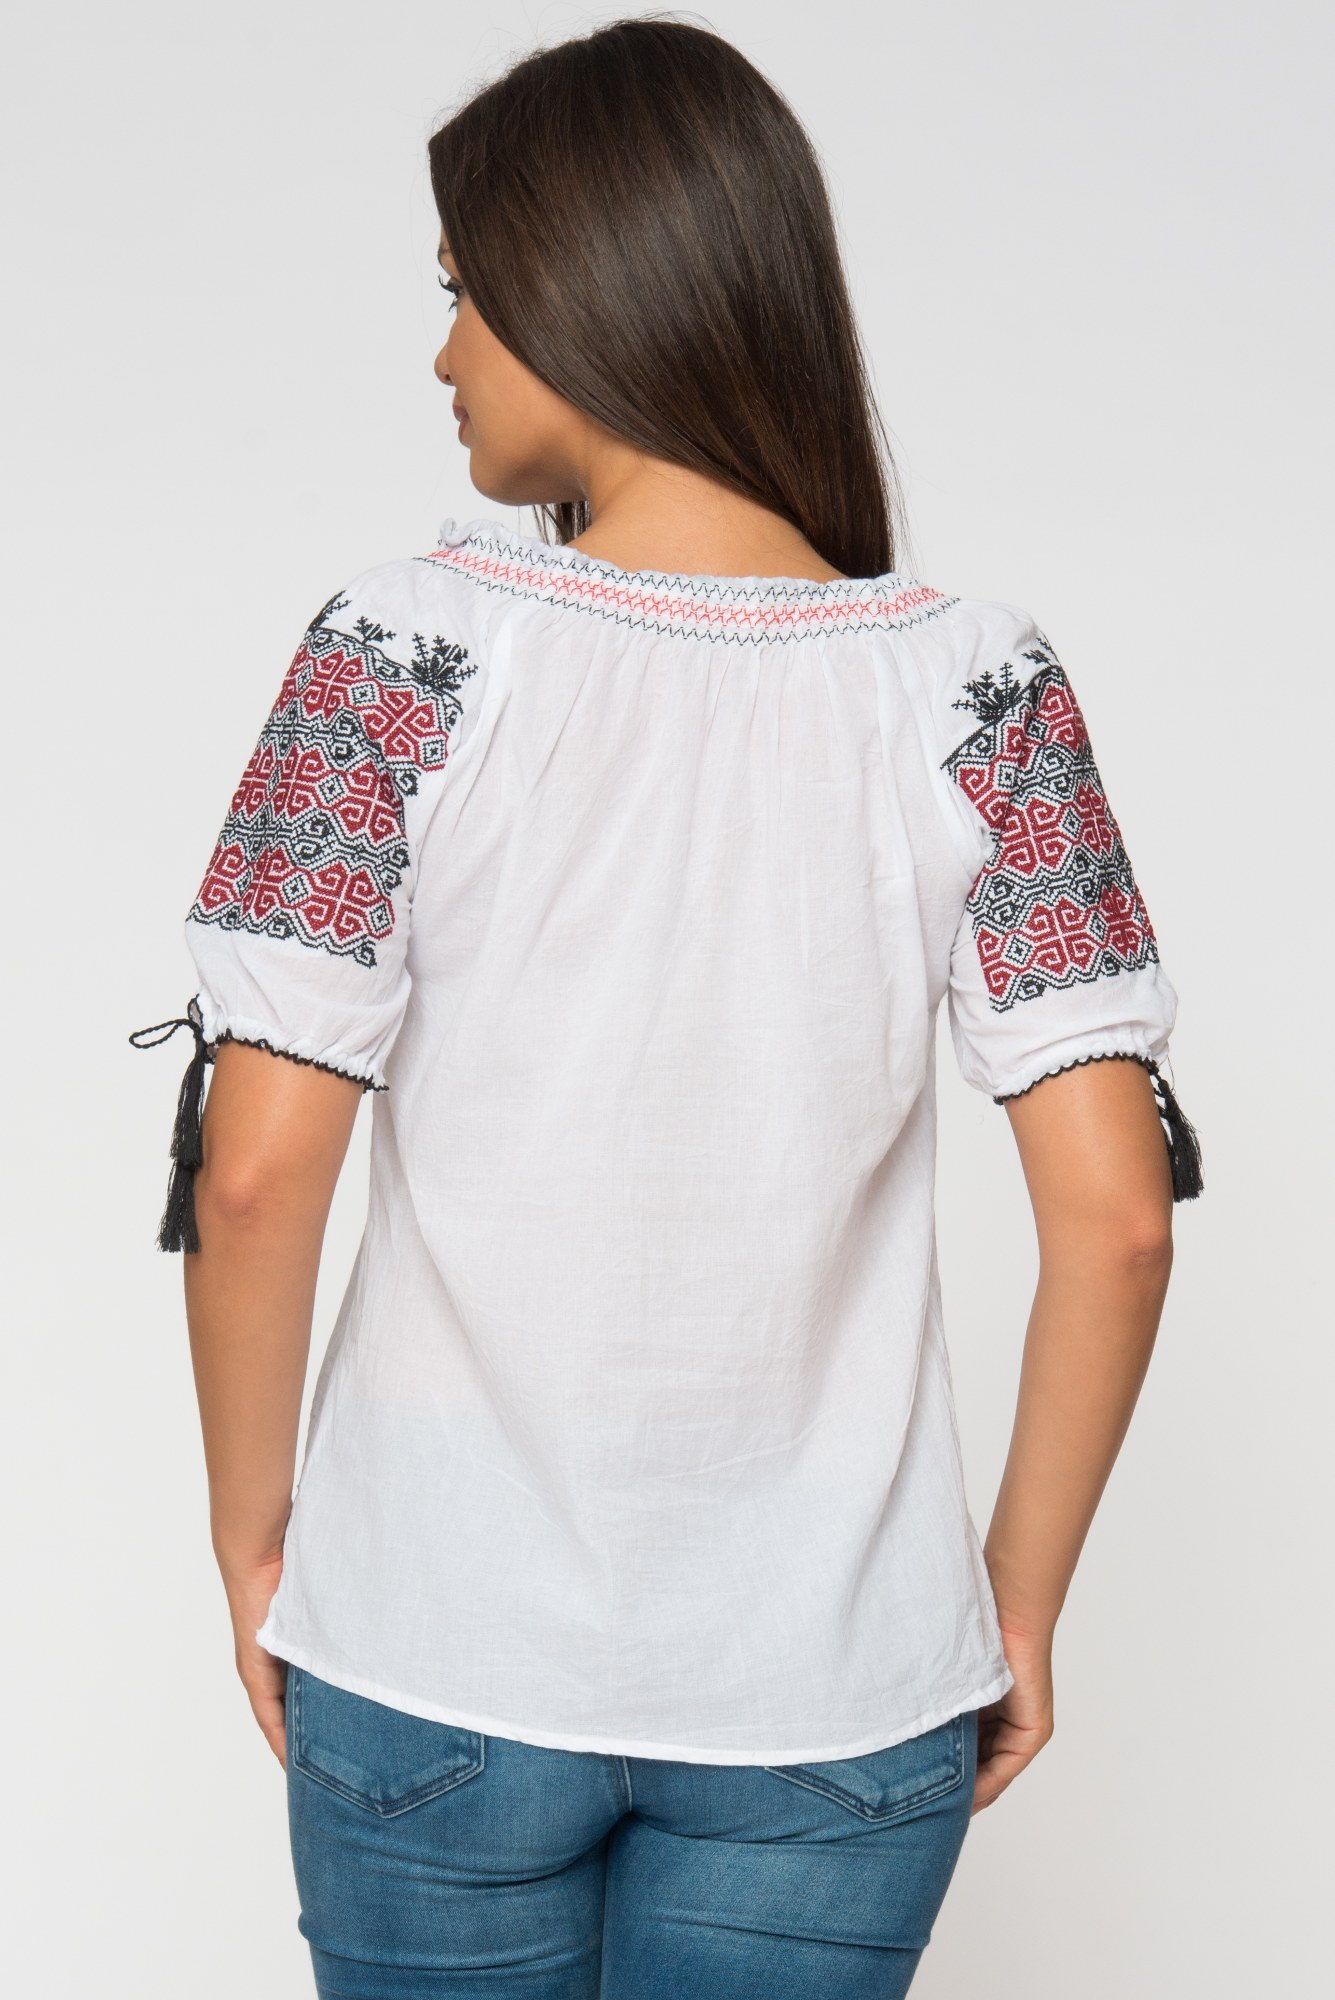 Bluza alba tip iie Arabelle cu broderie rosu-negru